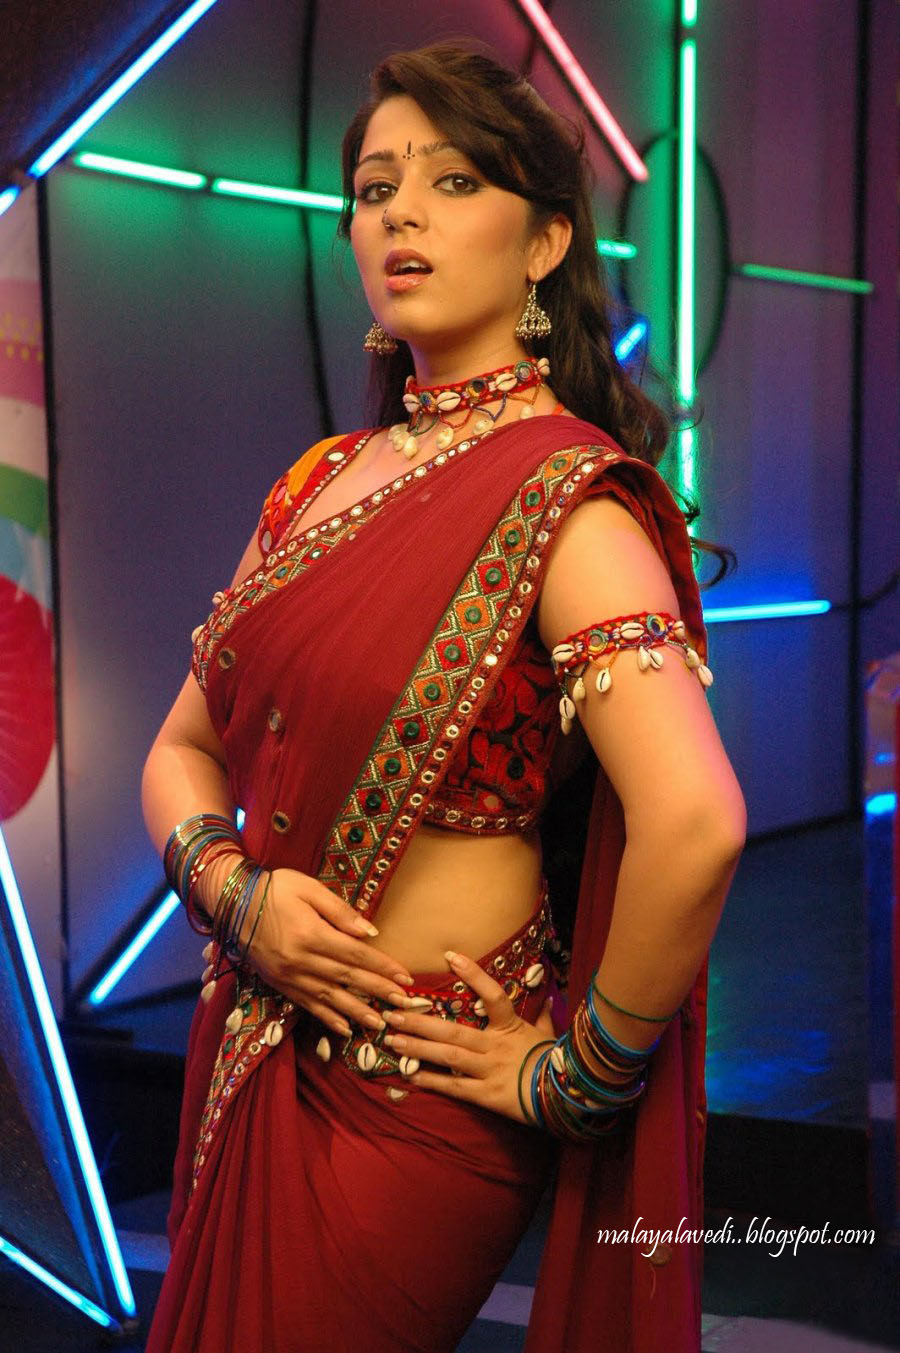 HOT SEXY PICS: Charmi Photo Gallery